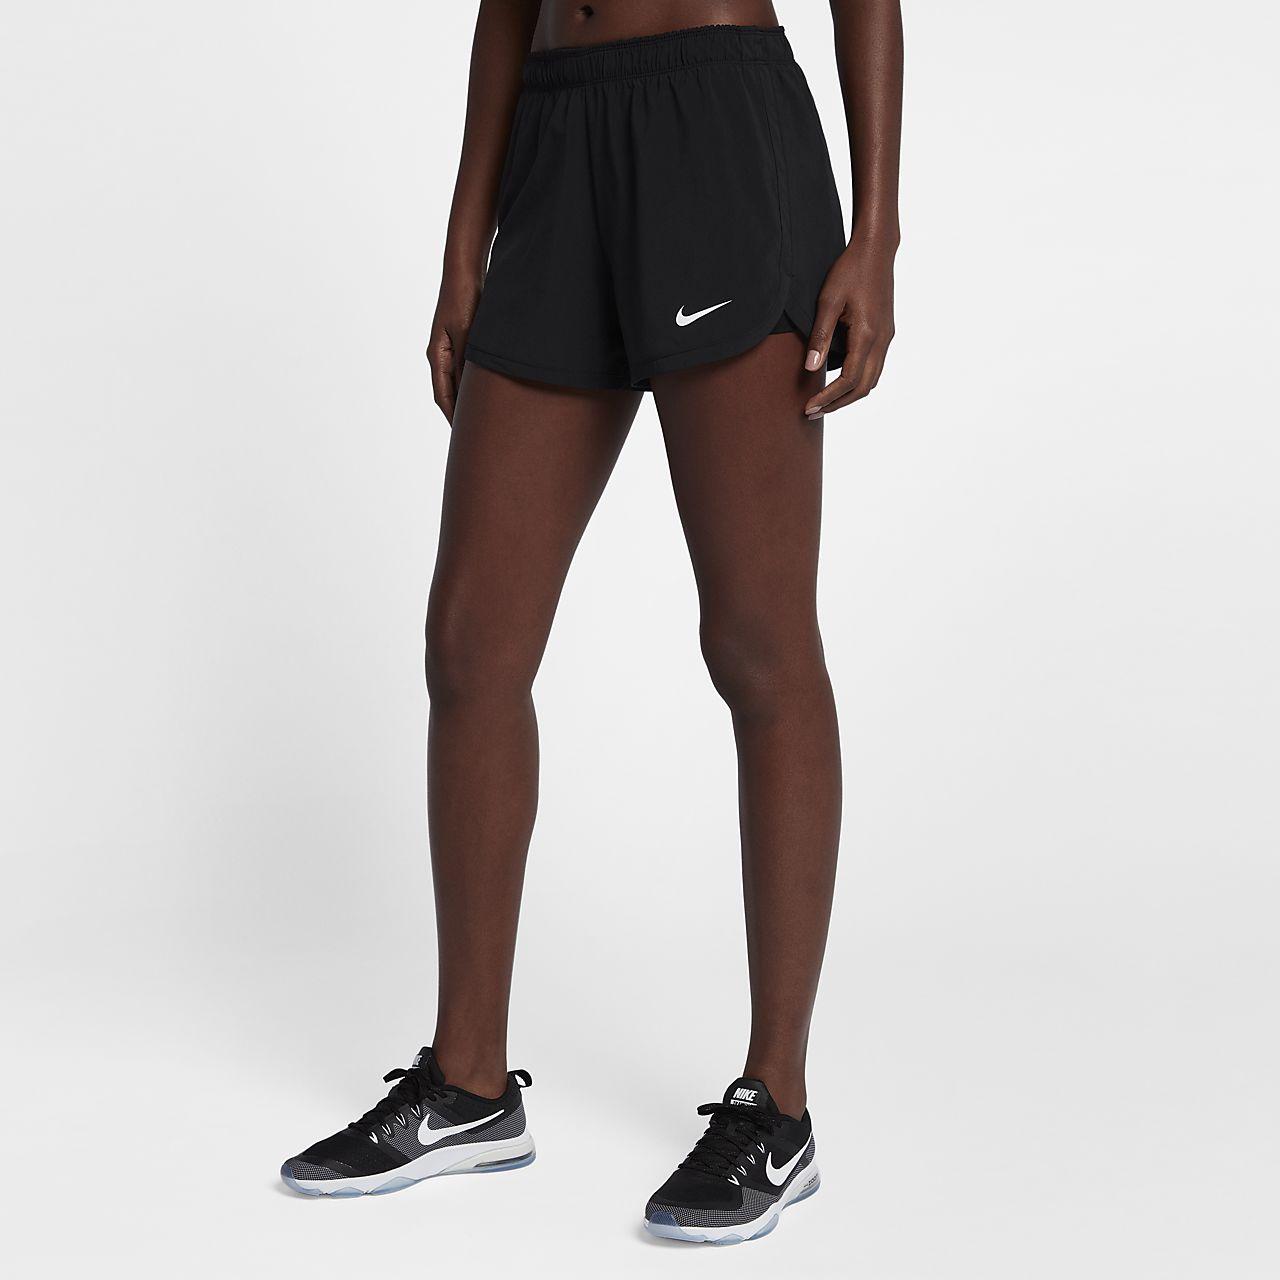 Low Resolution Nike Flex Women's Training Shorts Nike Flex Women's Training  Shorts